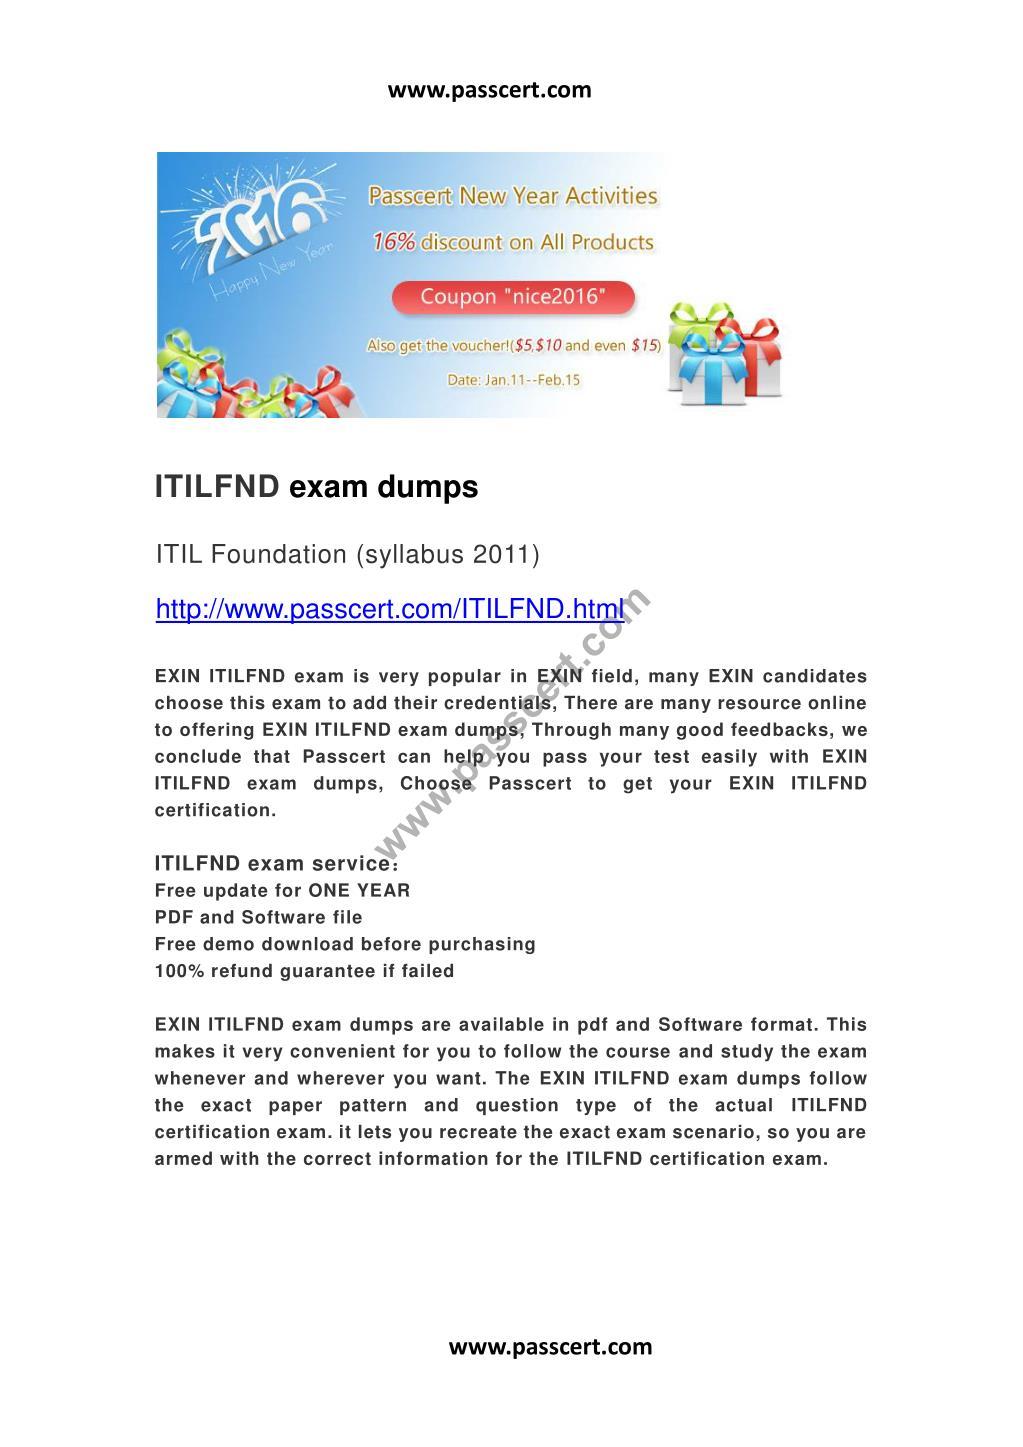 Ppt Exin Itilfnd Exam Dumps Powerpoint Presentation Id7289744